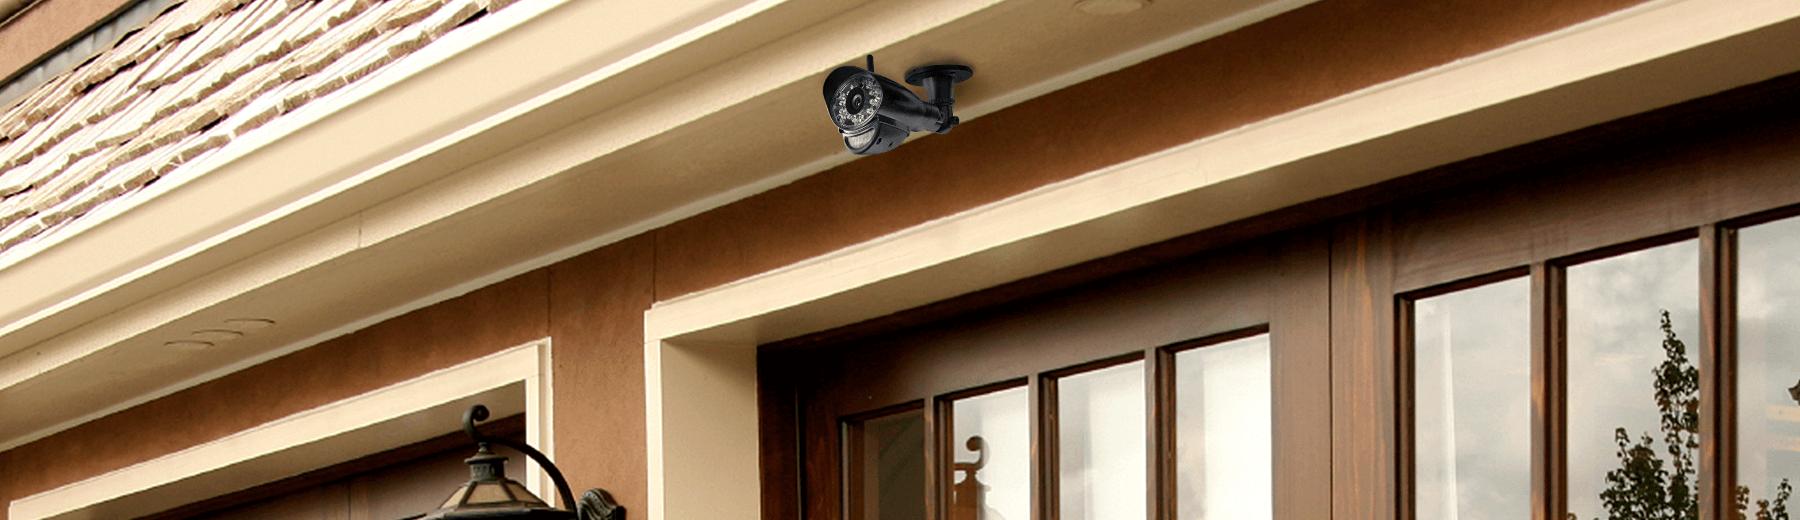 BBG security camera Georgina